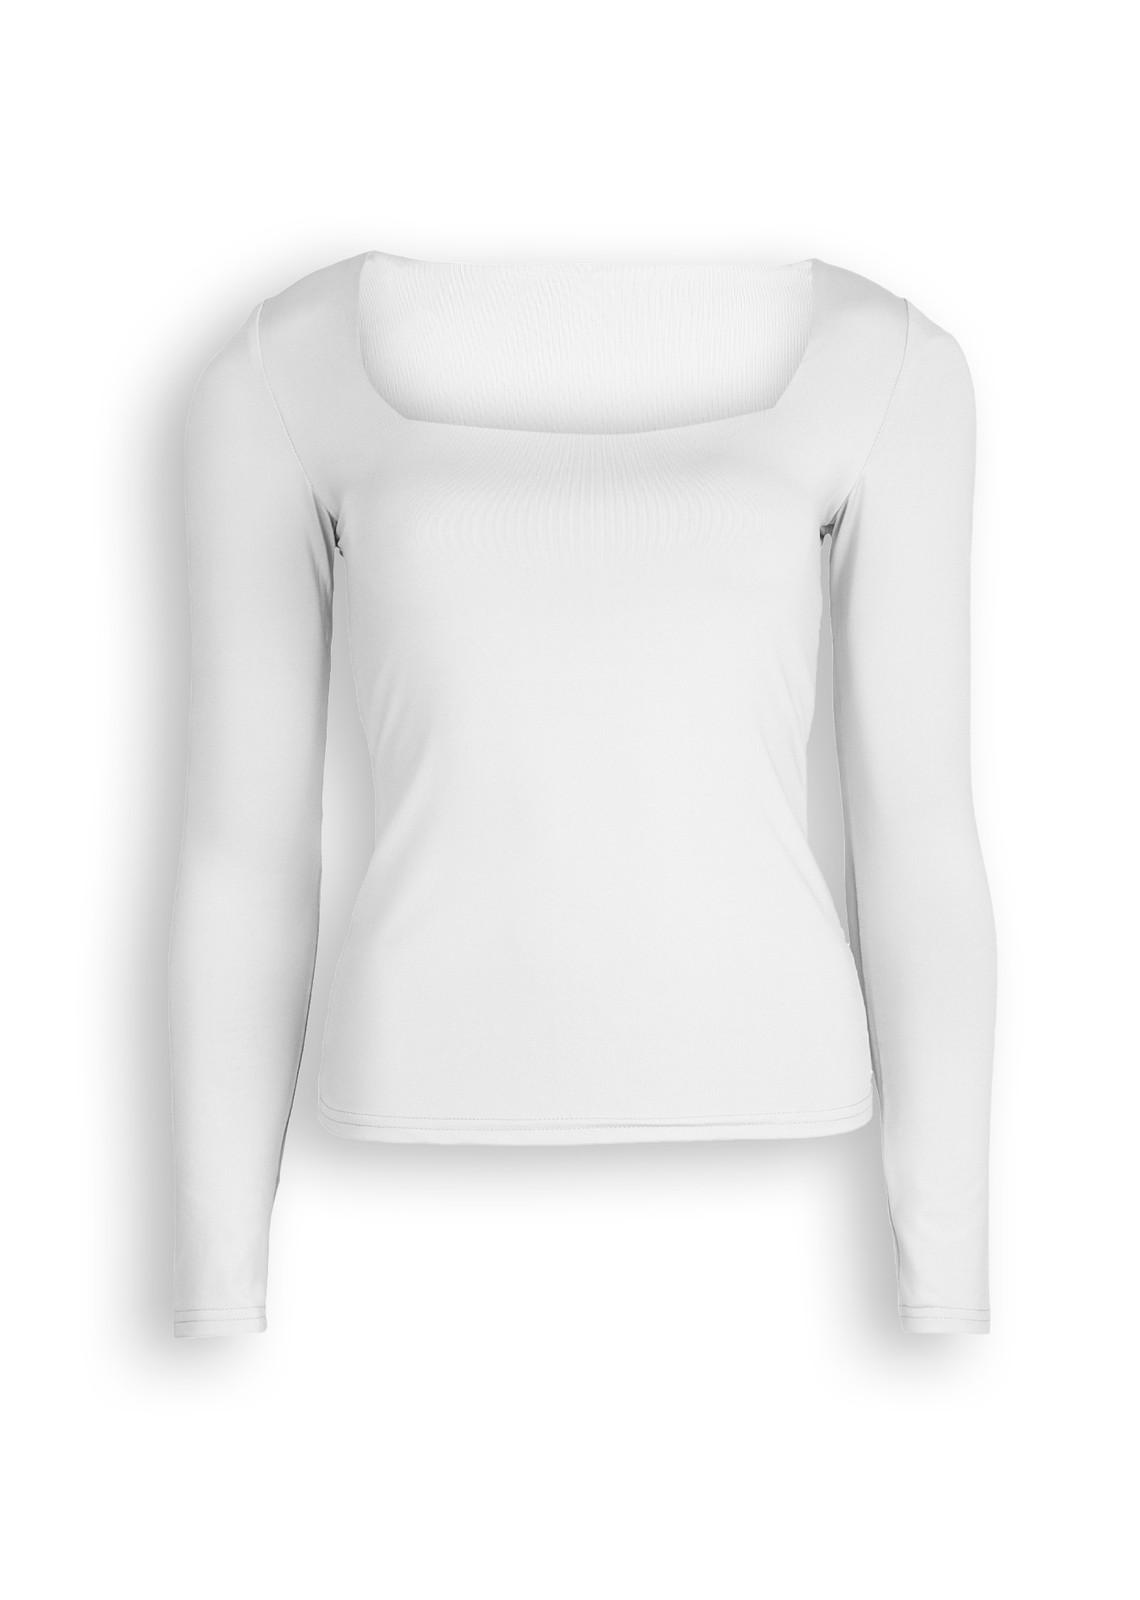 Basic stretch top Daisy white